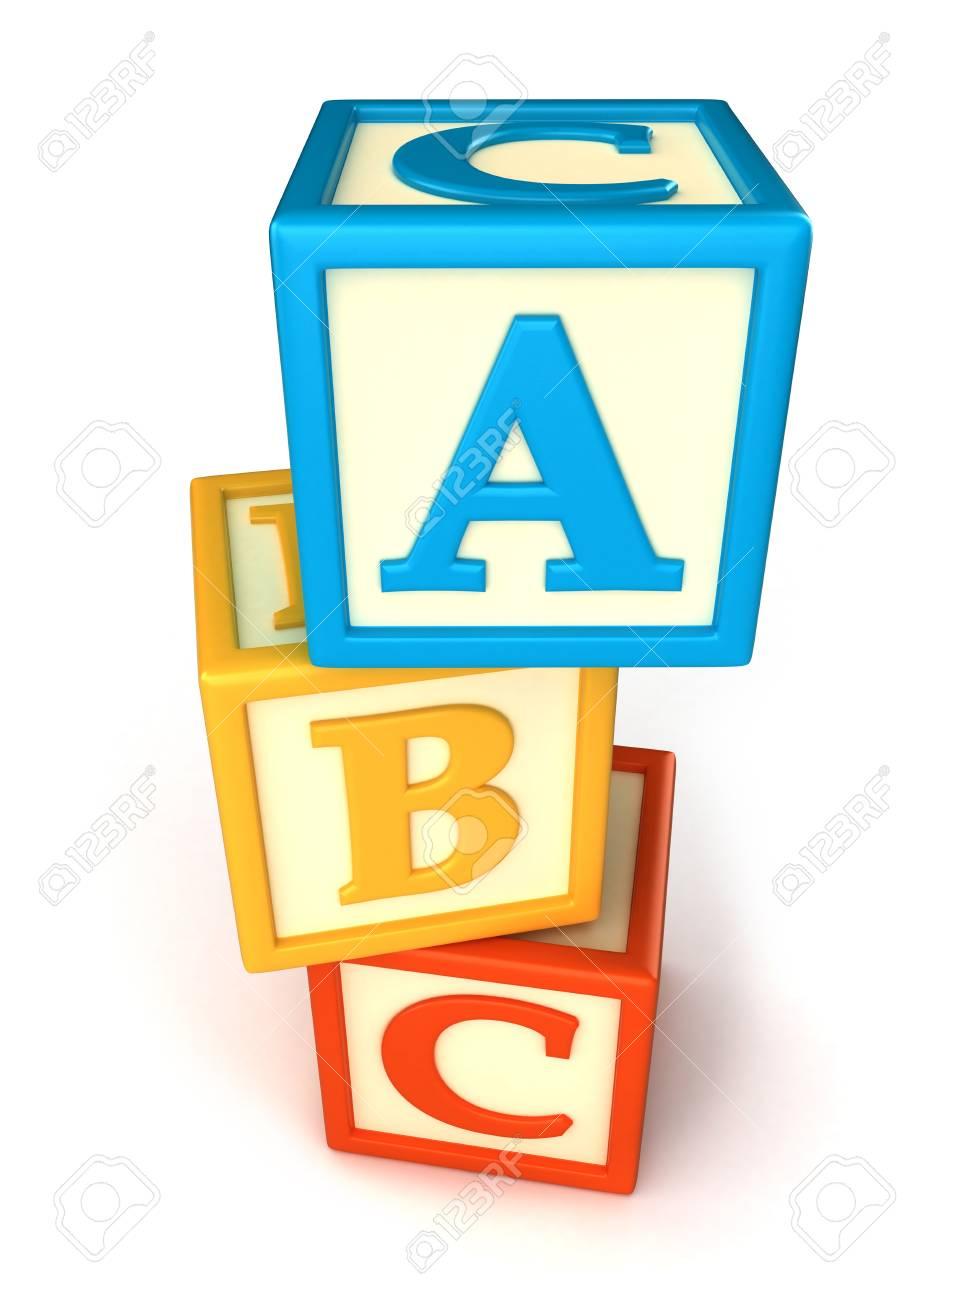 ABC building blocks on white background.